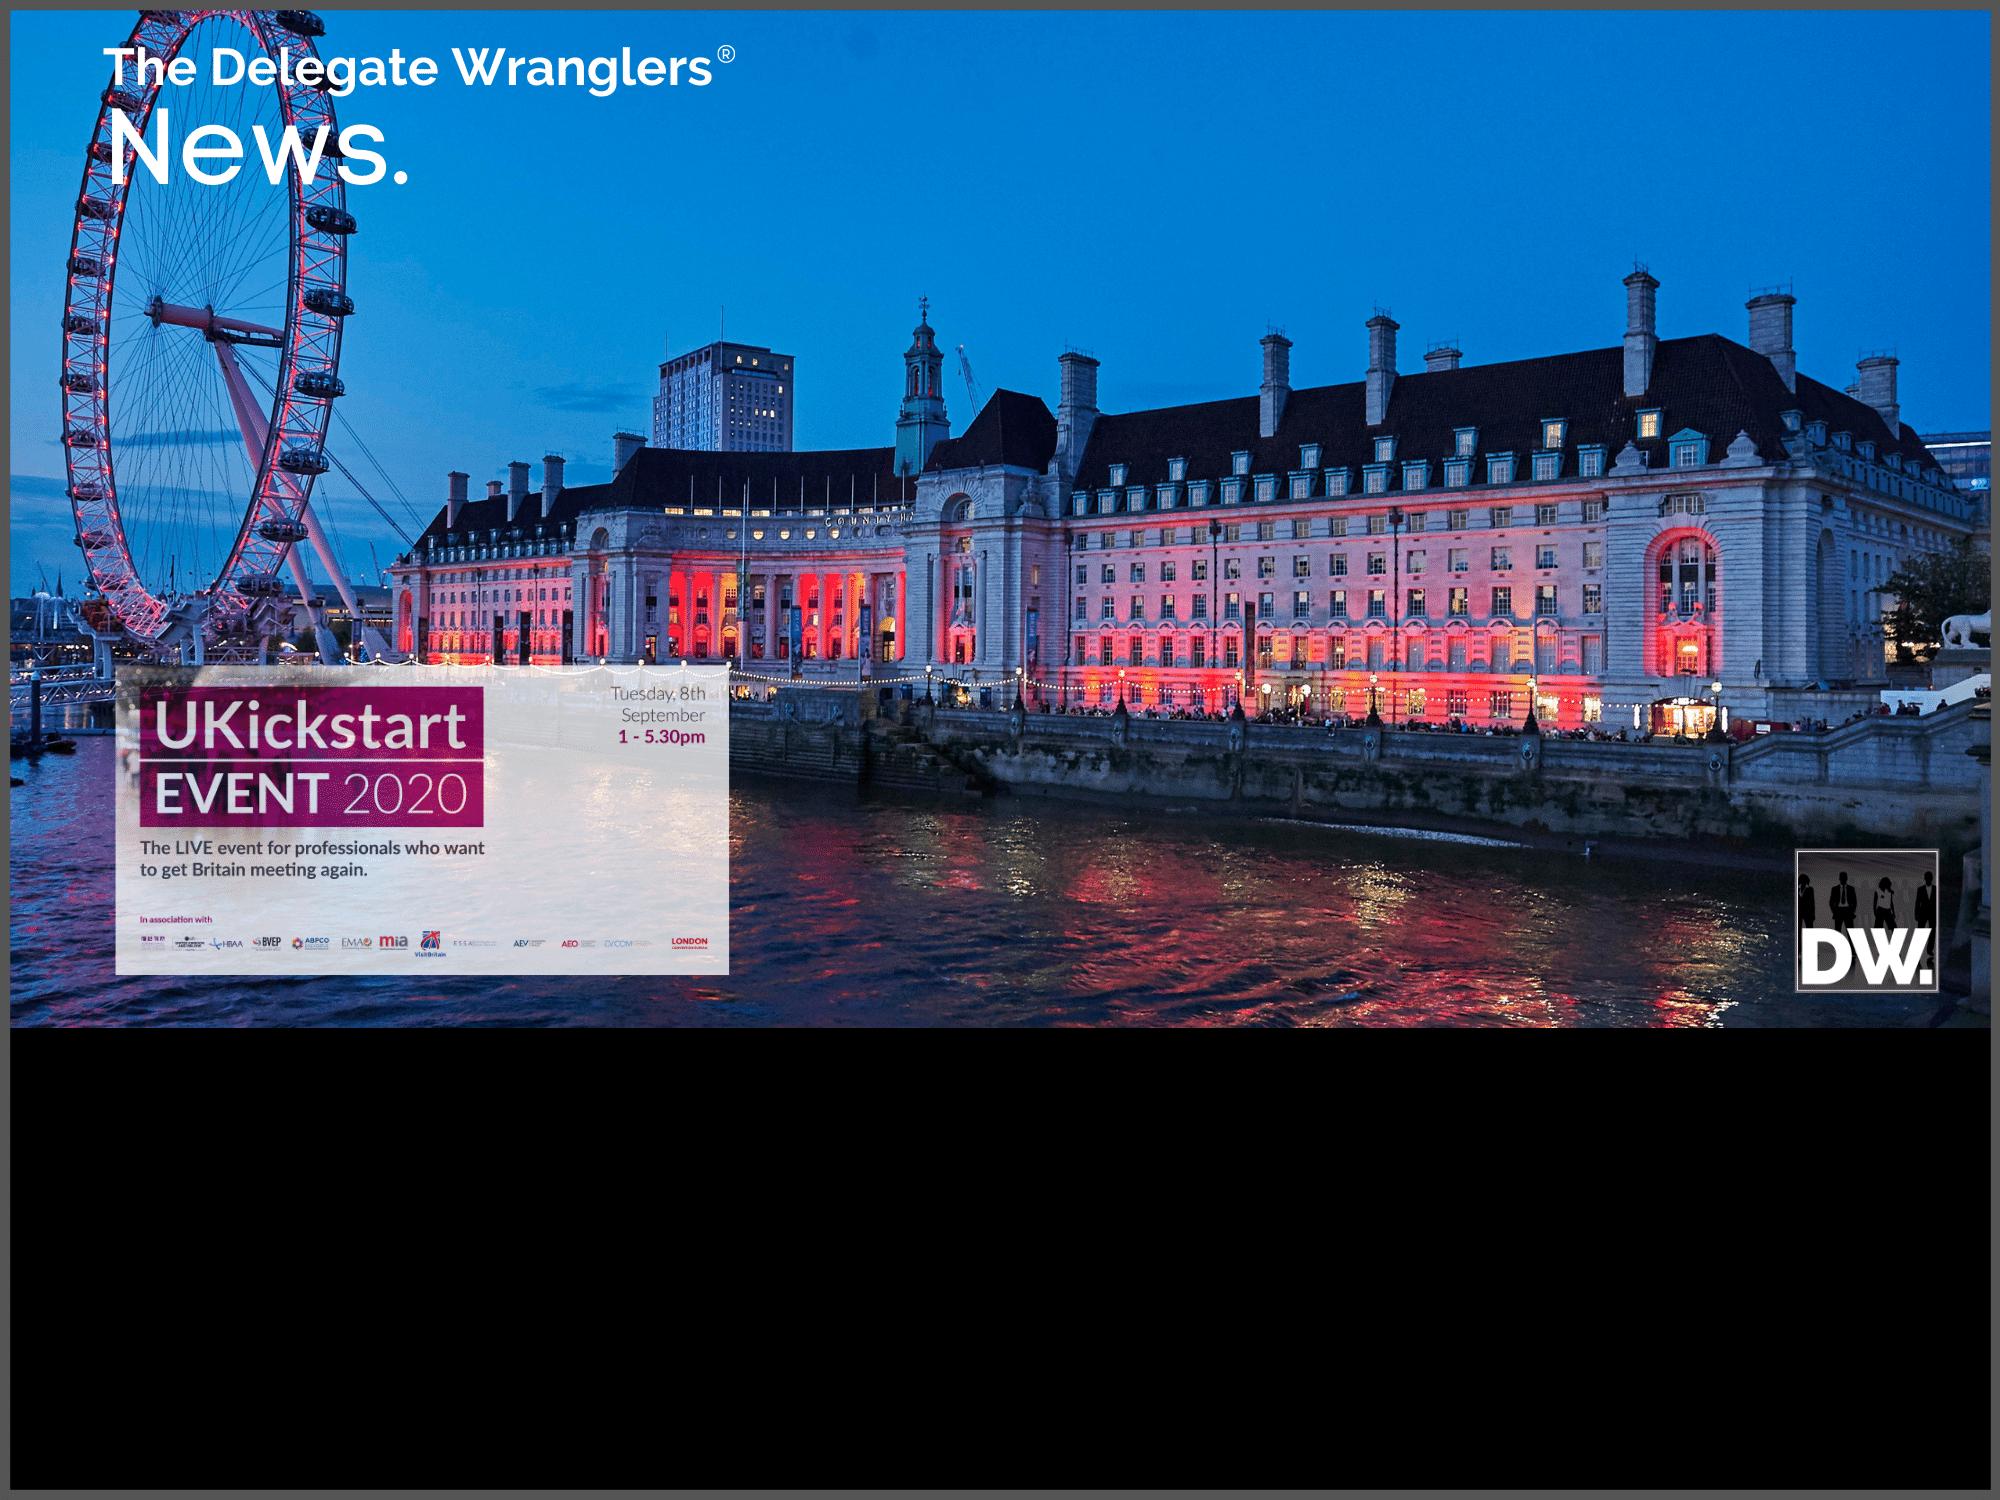 Nick de Bois joins panel of leaders for UKickstart